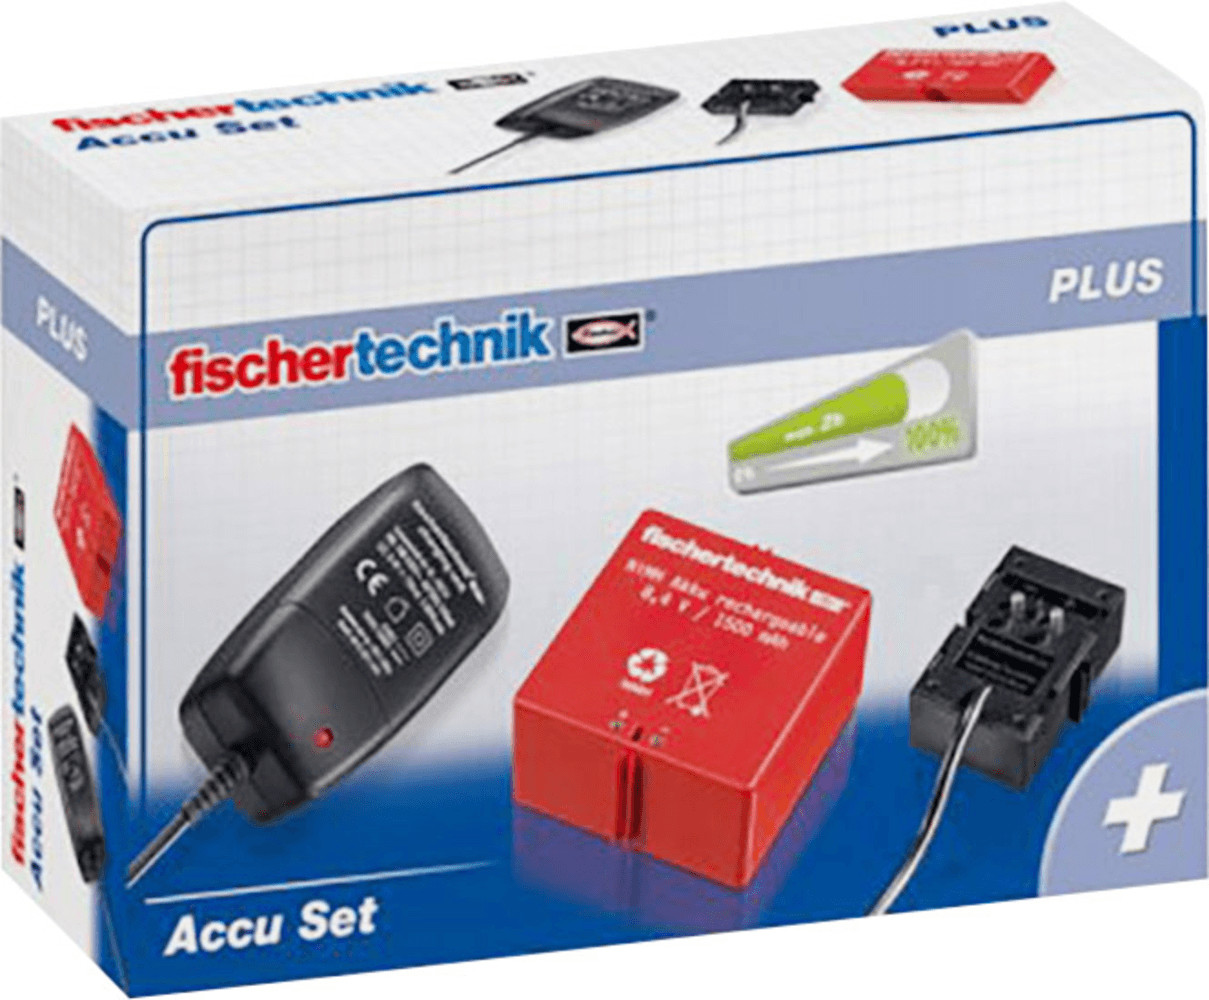 Fischertechnik Plus - Accu Set (34969)